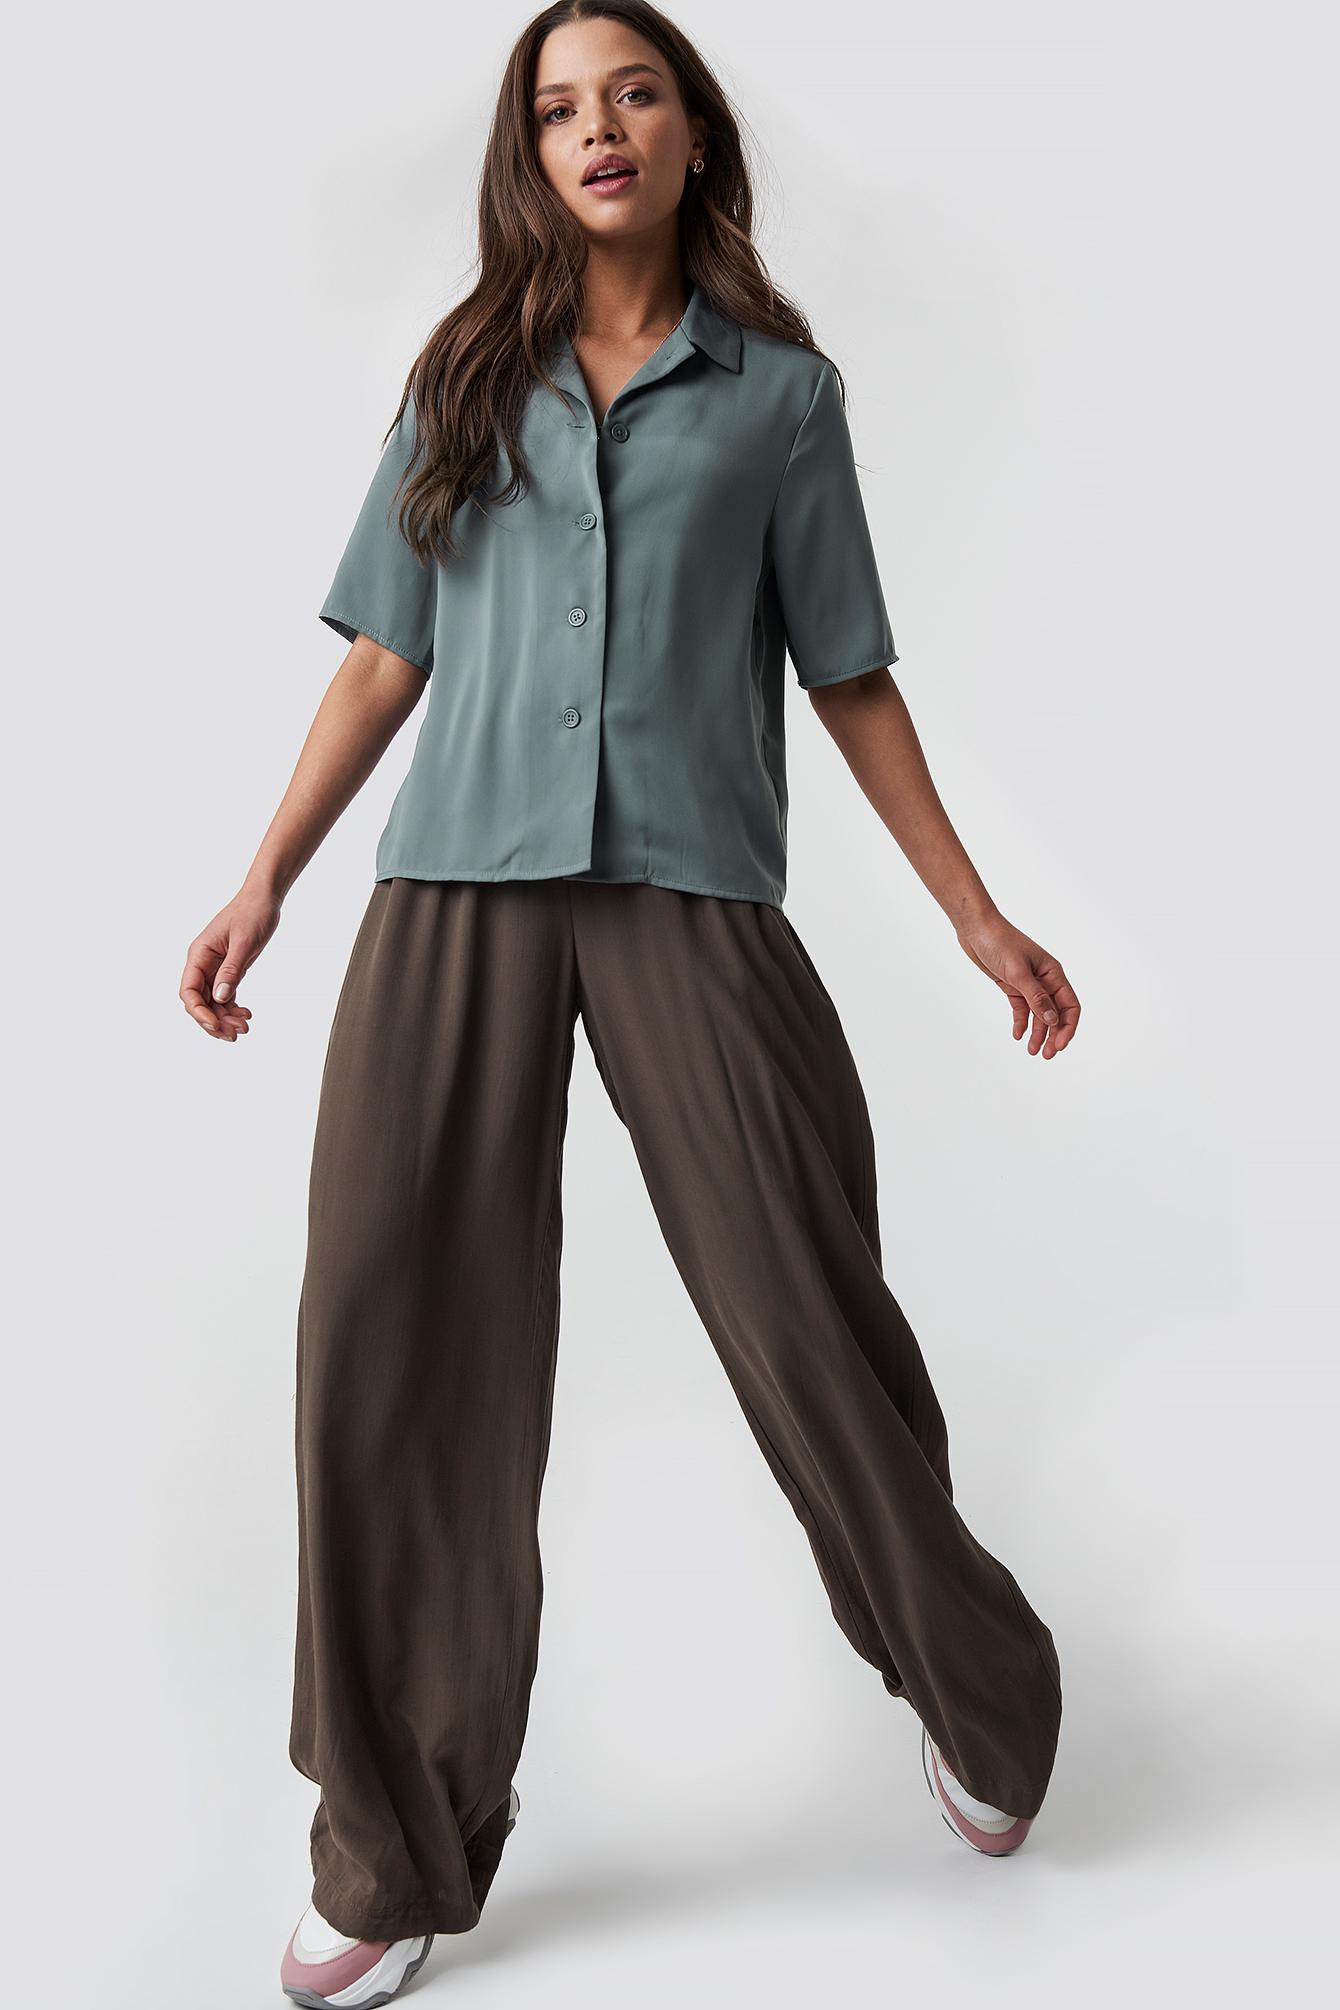 emilie briting x na-kd -  Put On Suit Pants - Brown